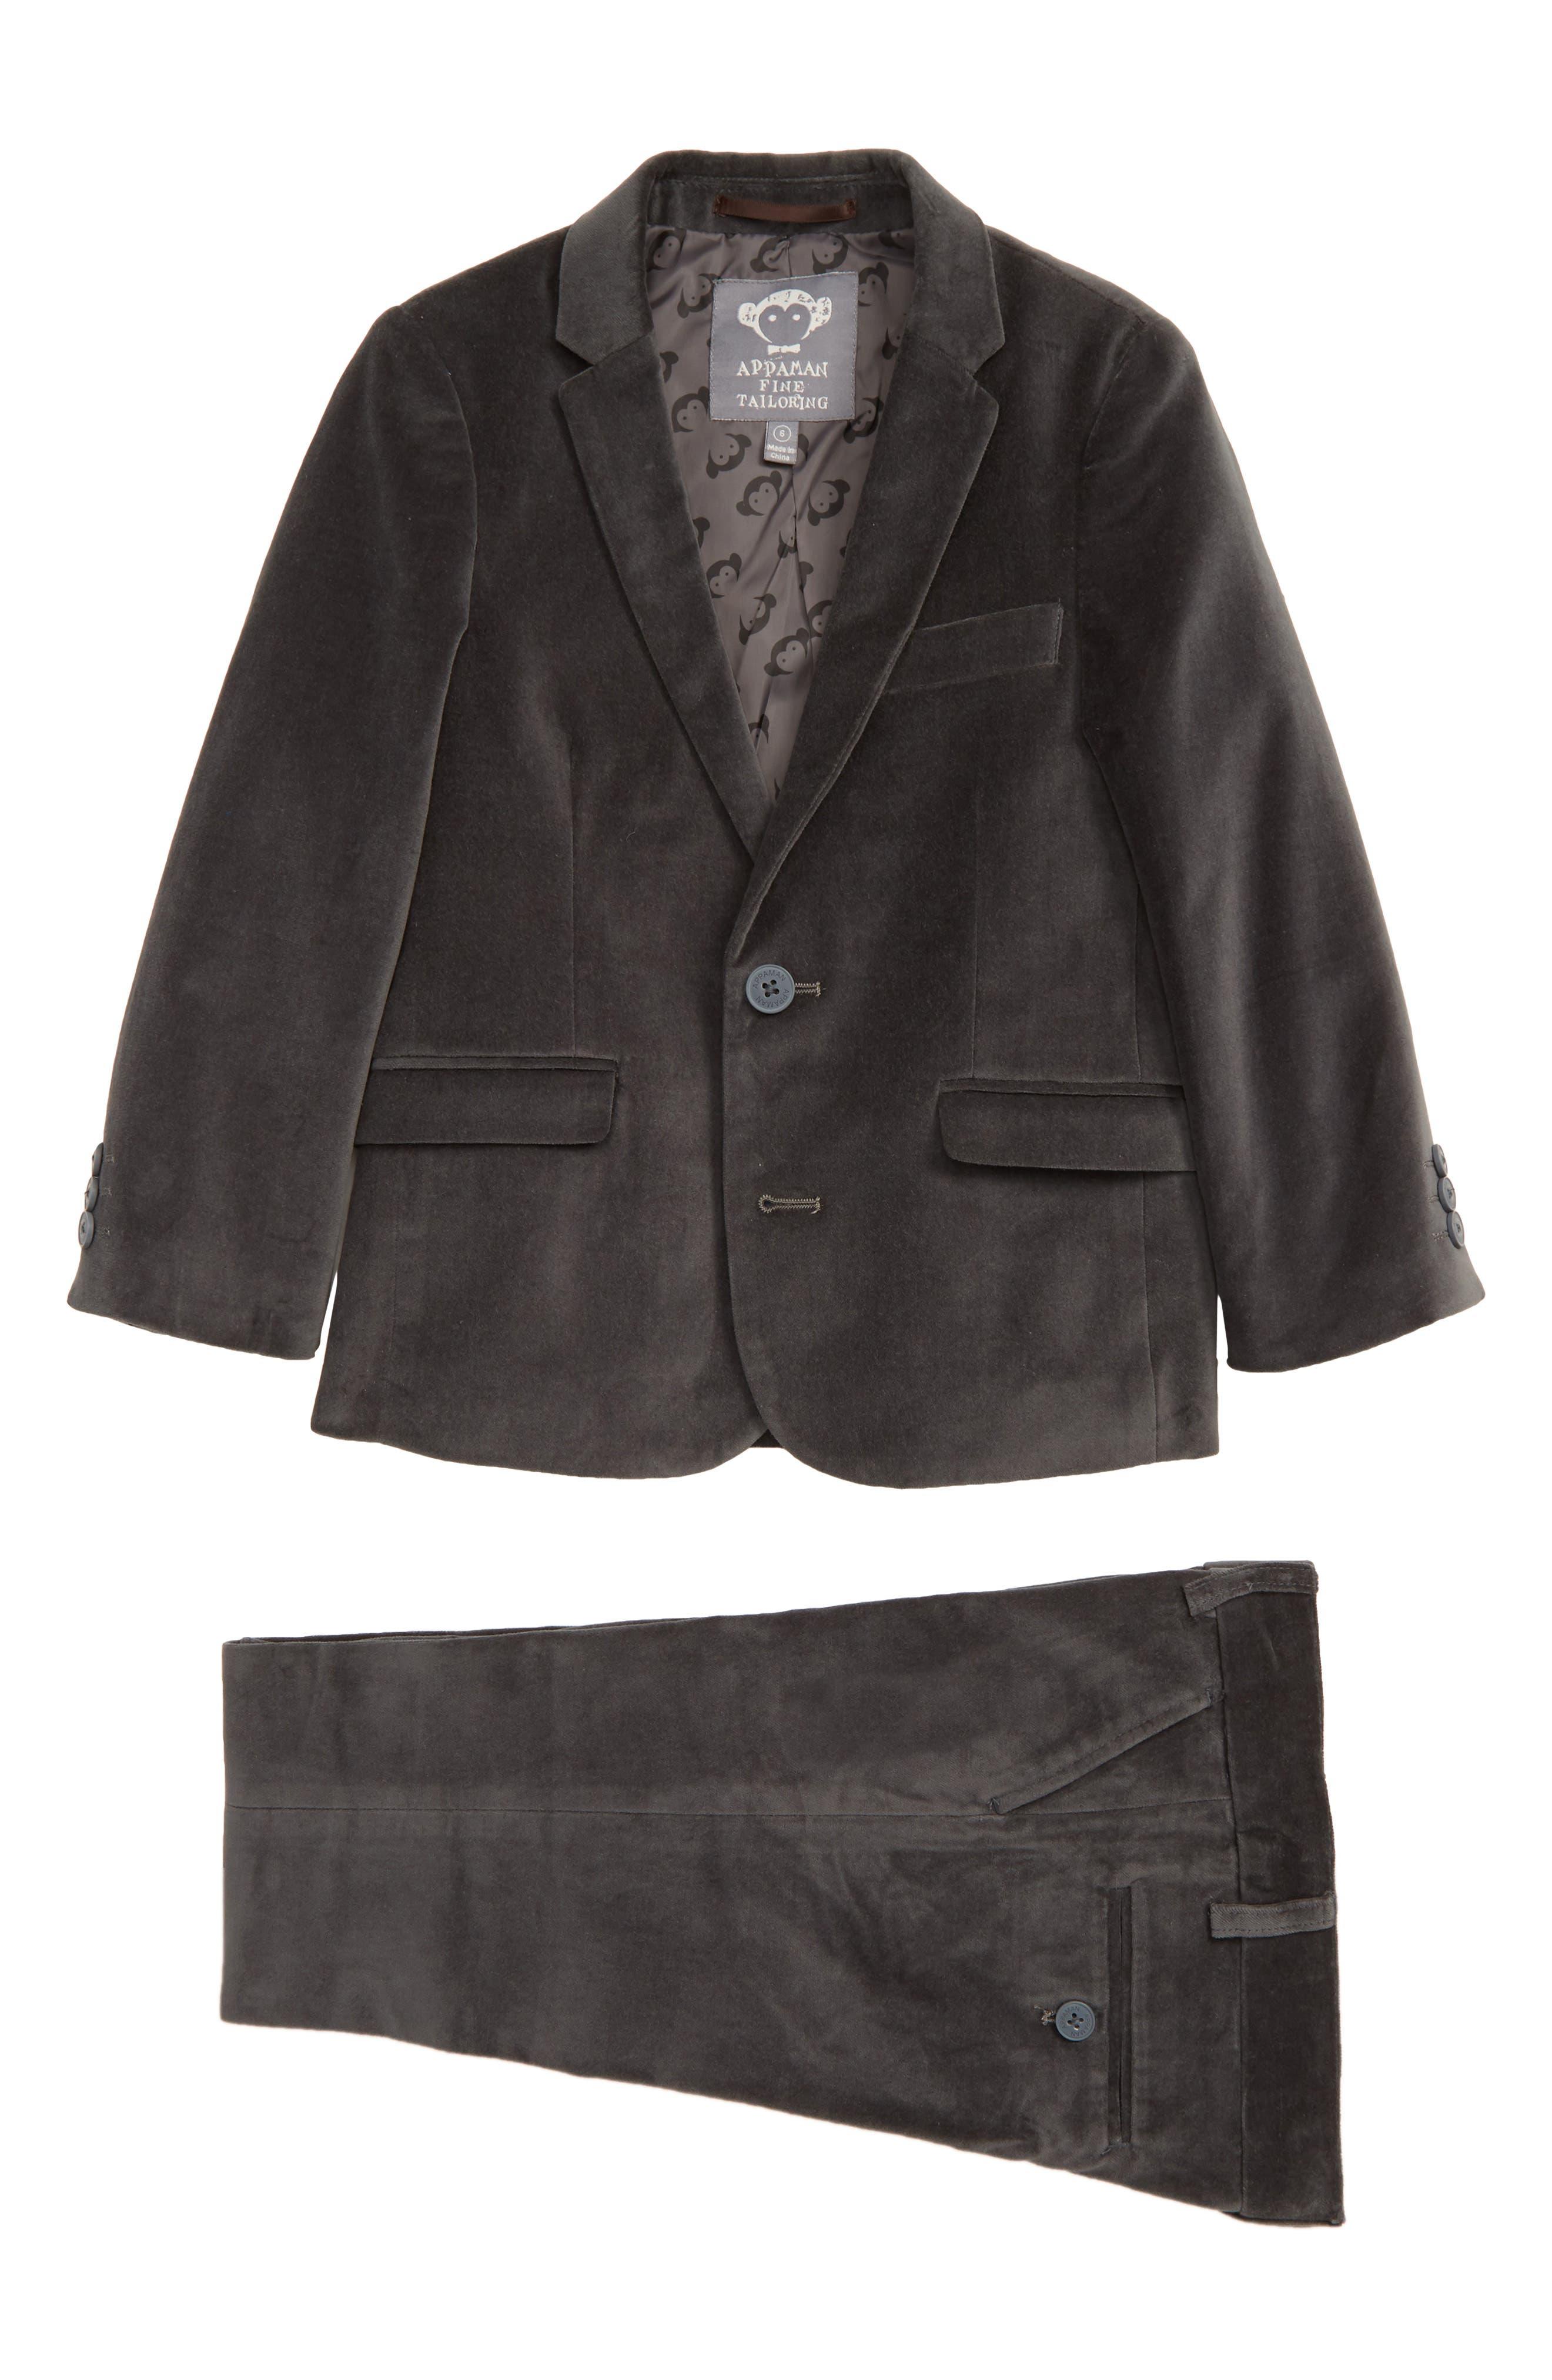 Mod Velvet Suit,                             Main thumbnail 1, color,                             VINTAGE BLACK VELVET